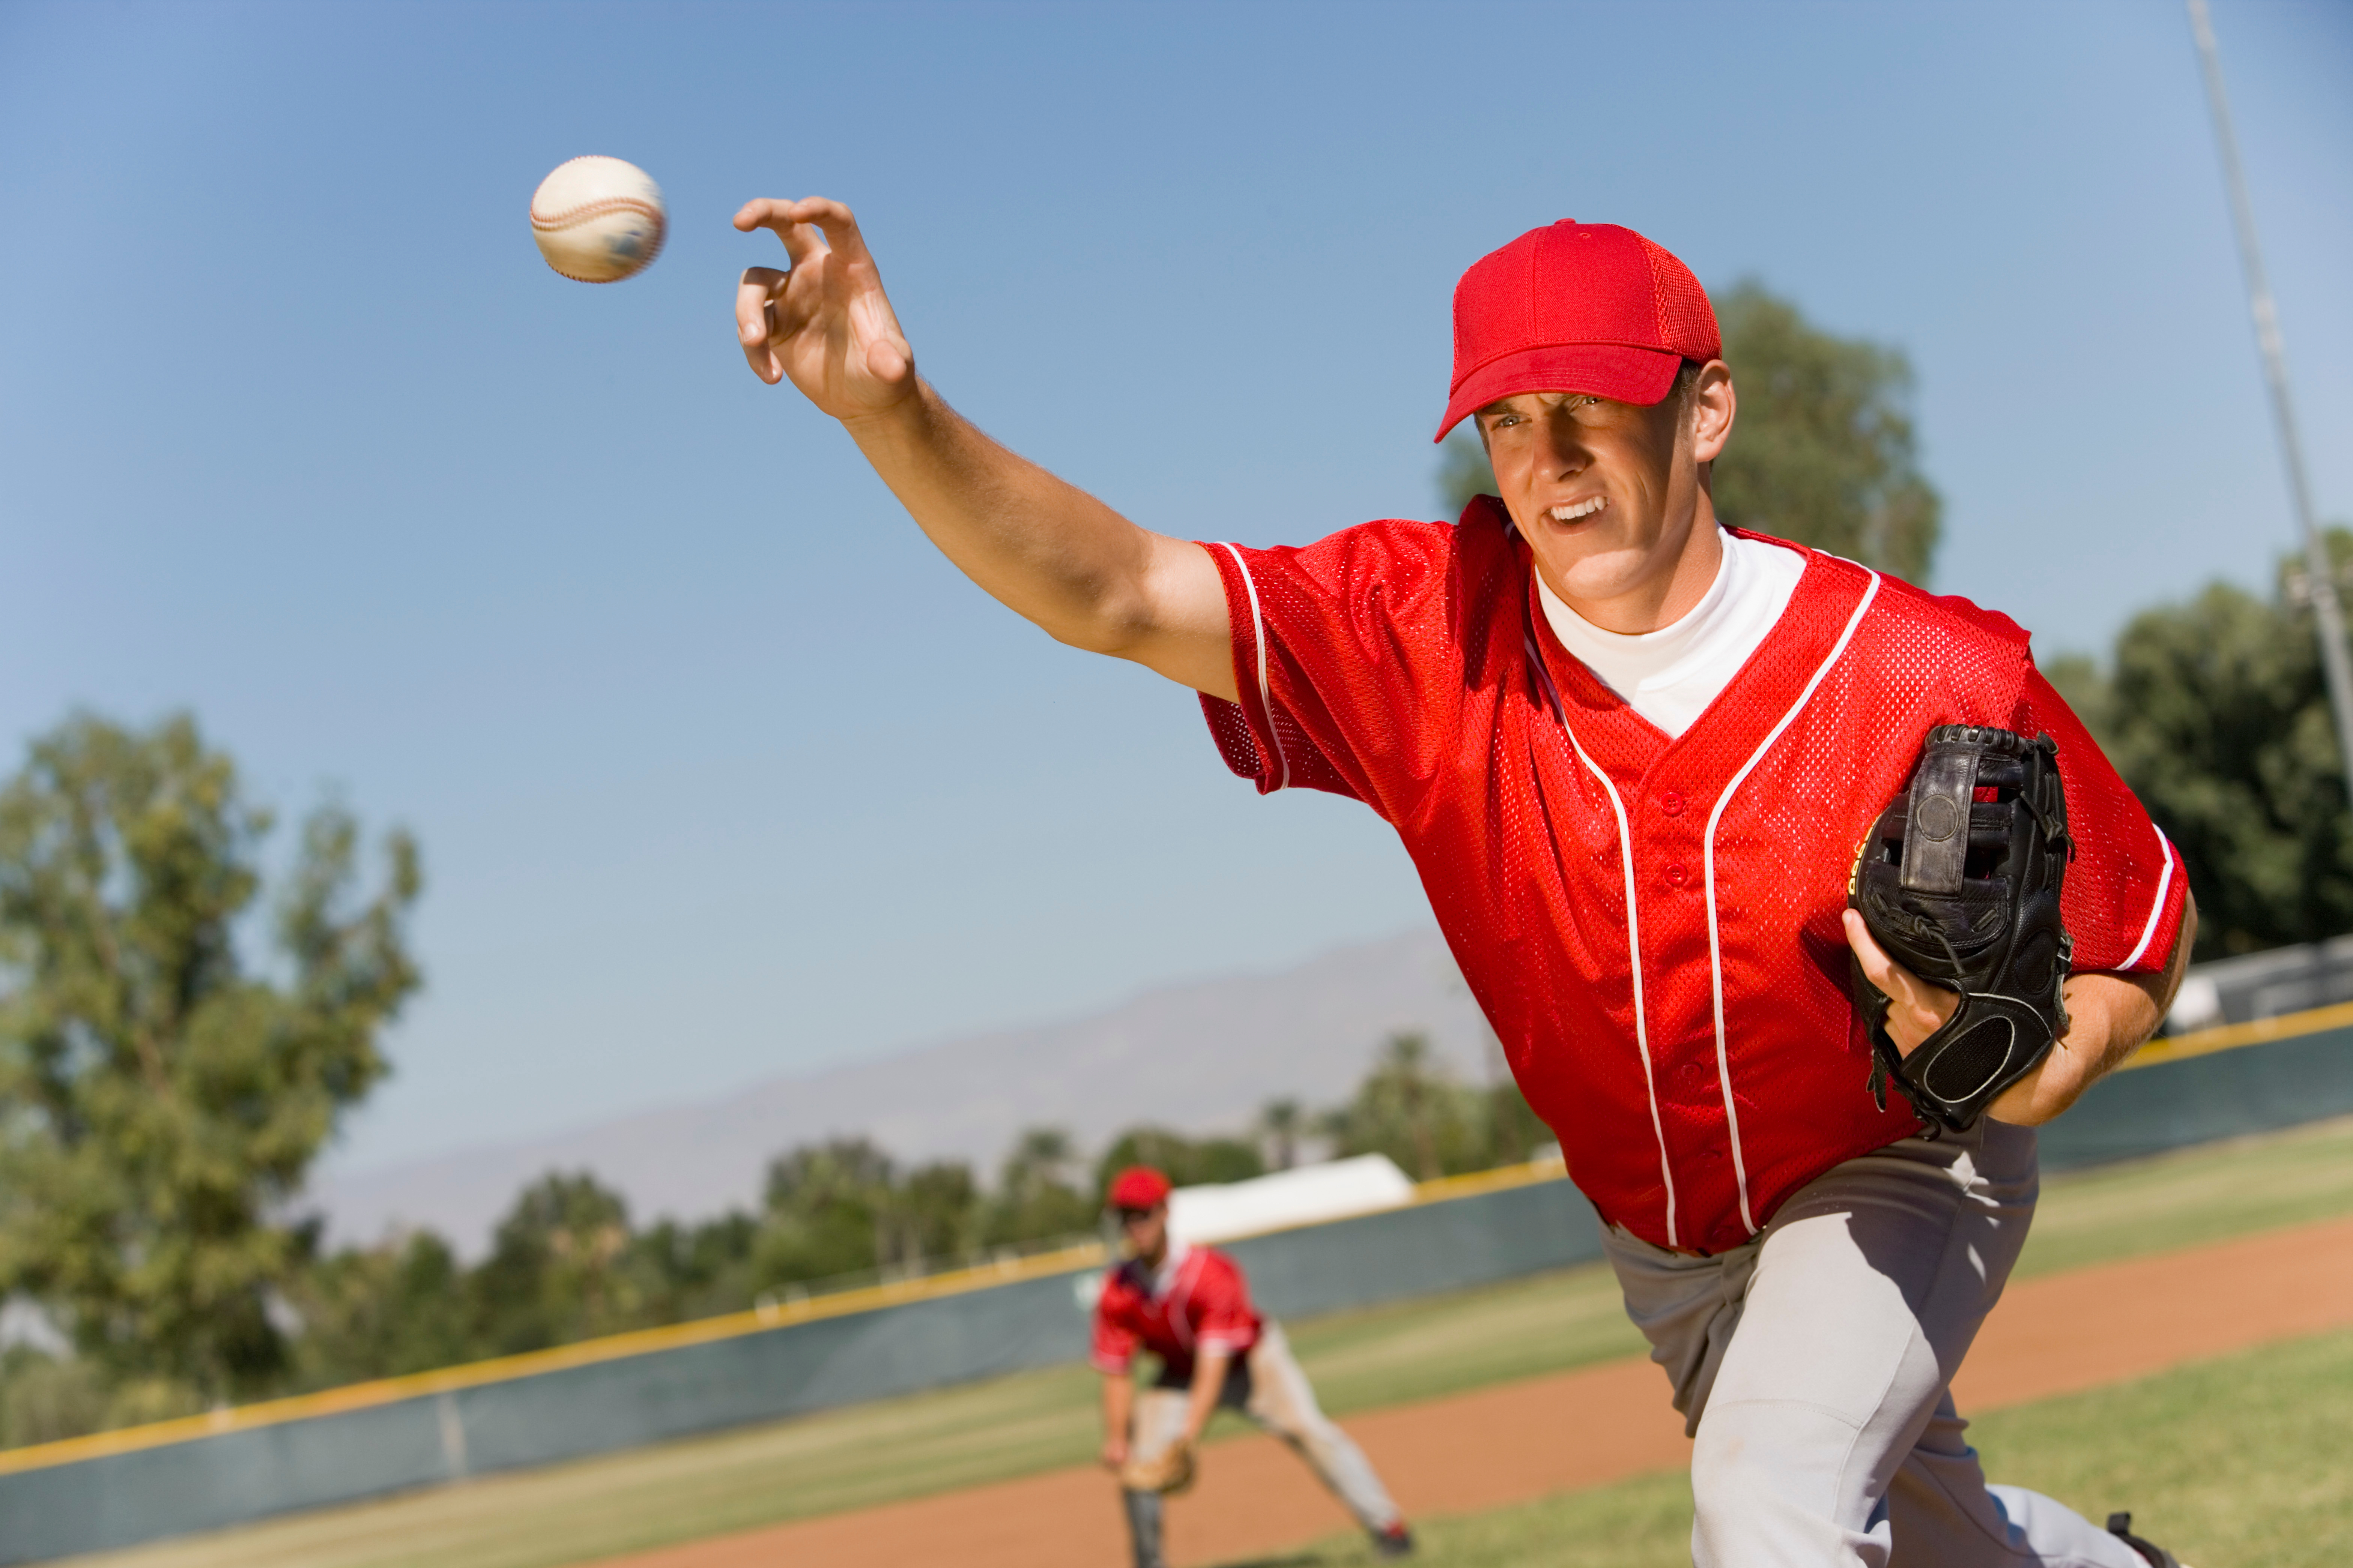 Pitcher Releasing Baseball